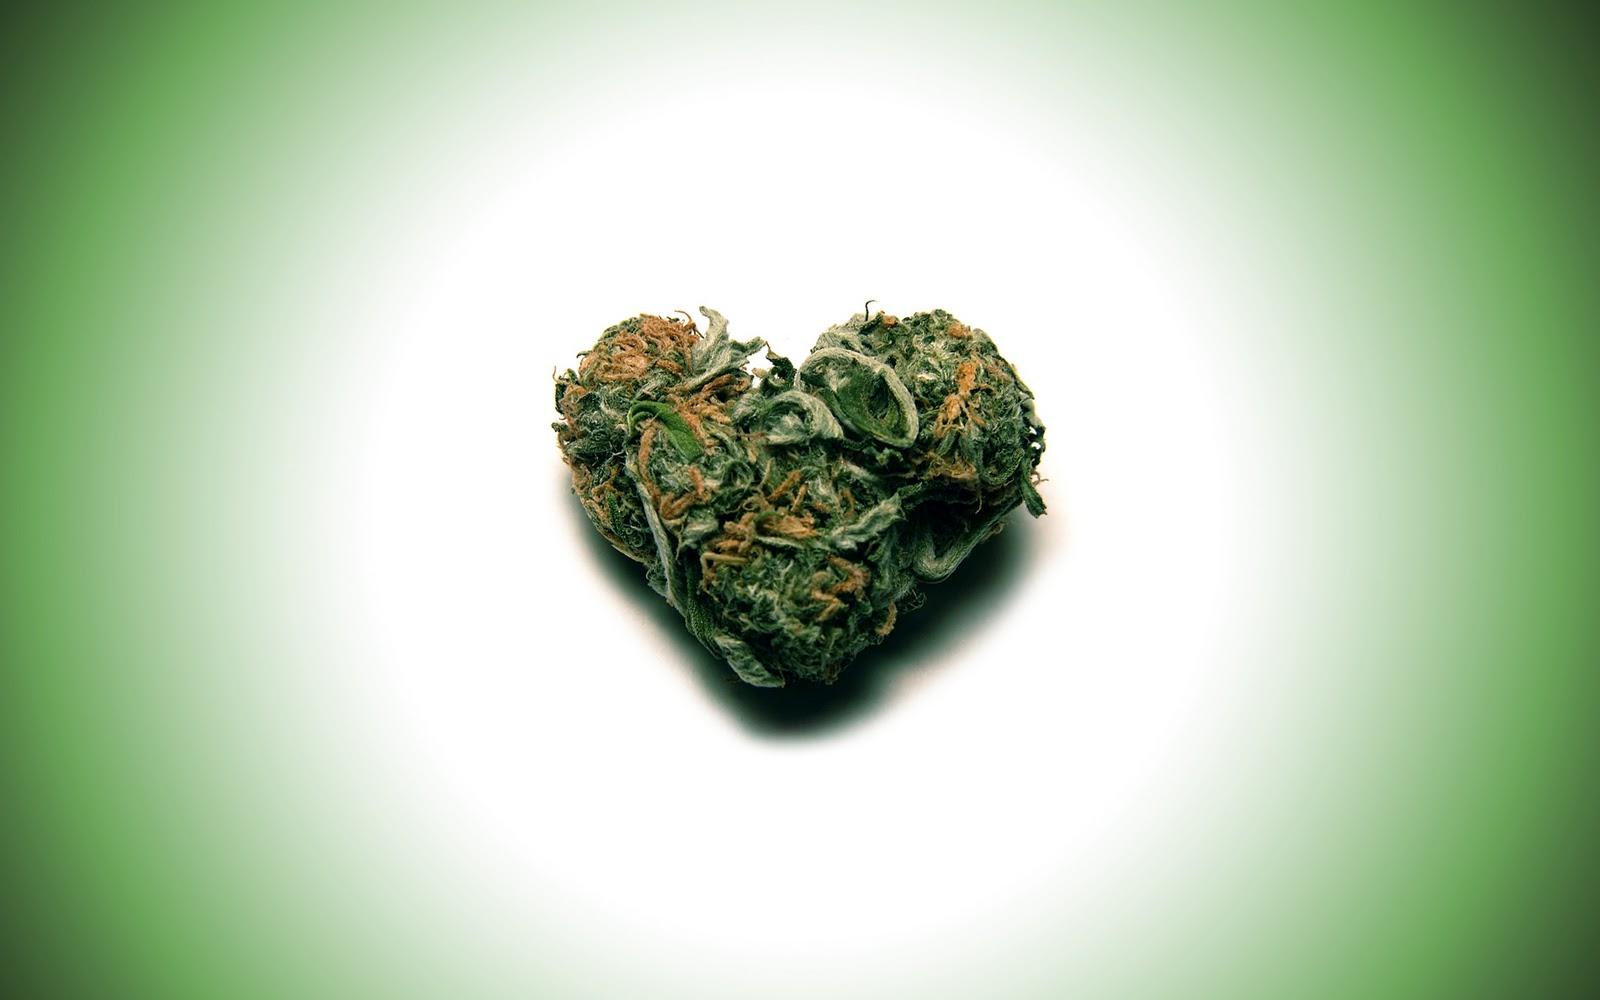 http://2.bp.blogspot.com/_-xMhVmY1fo0/TOmJpVKh0EI/AAAAAAAAAJA/r0ULl-5pKpU/s1600/heart+weed.jpg